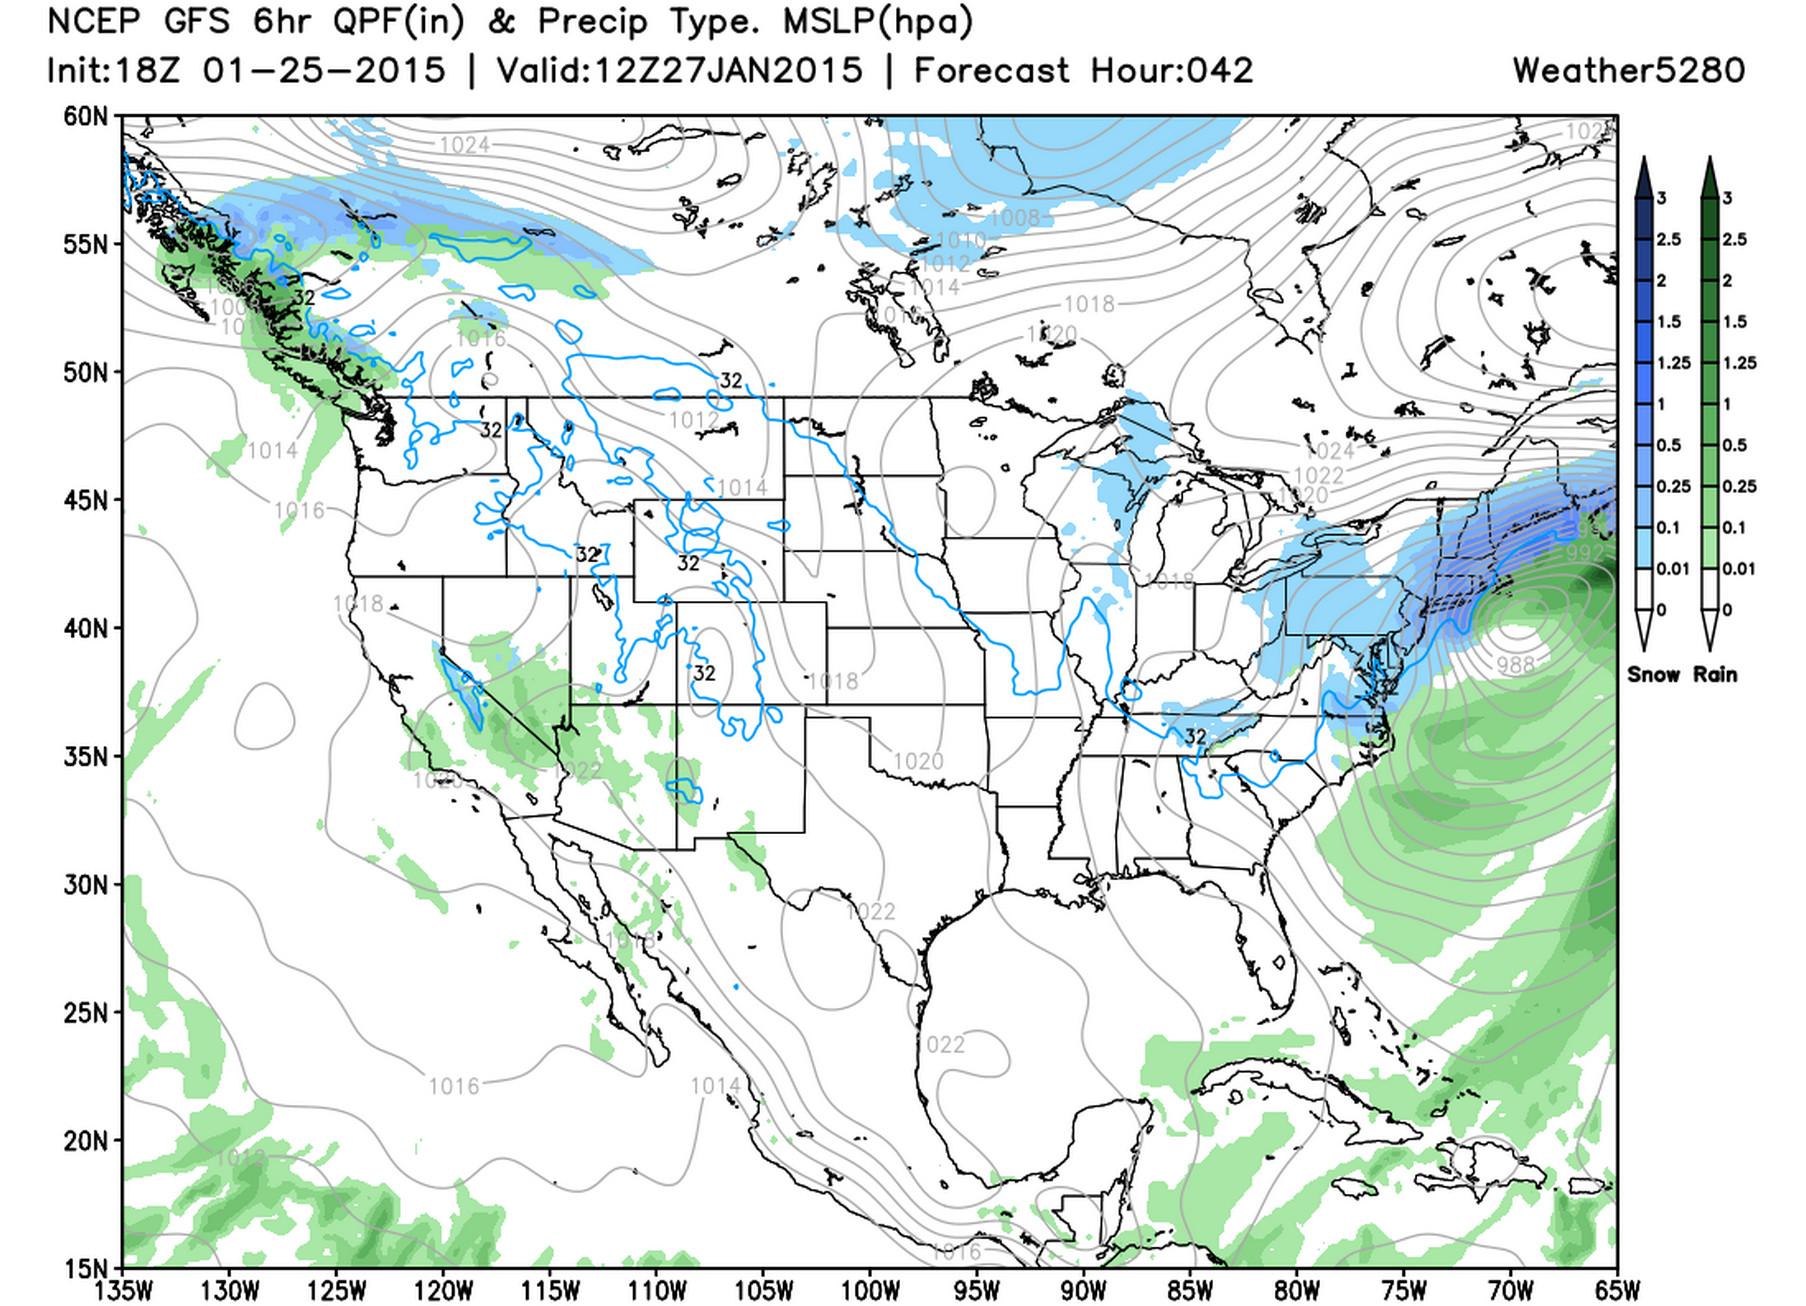 GFS surface pressure, precip type | Weather5280 Models